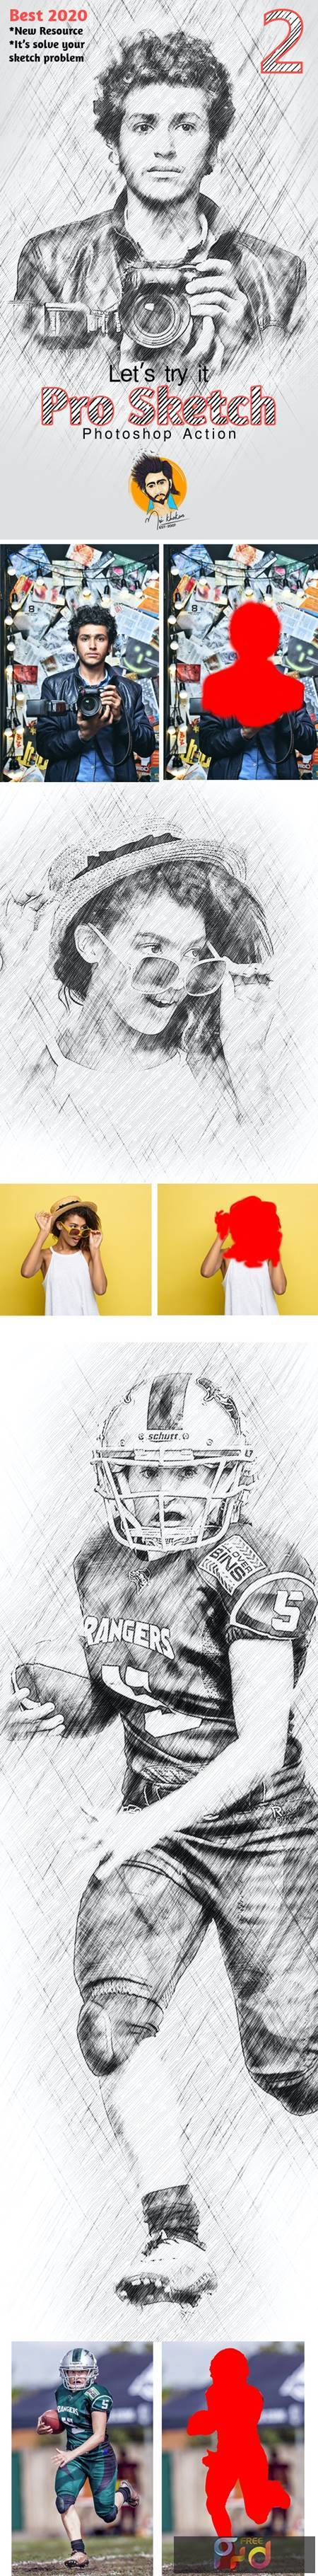 Pro Sketch Photoshop Action 28848536 1